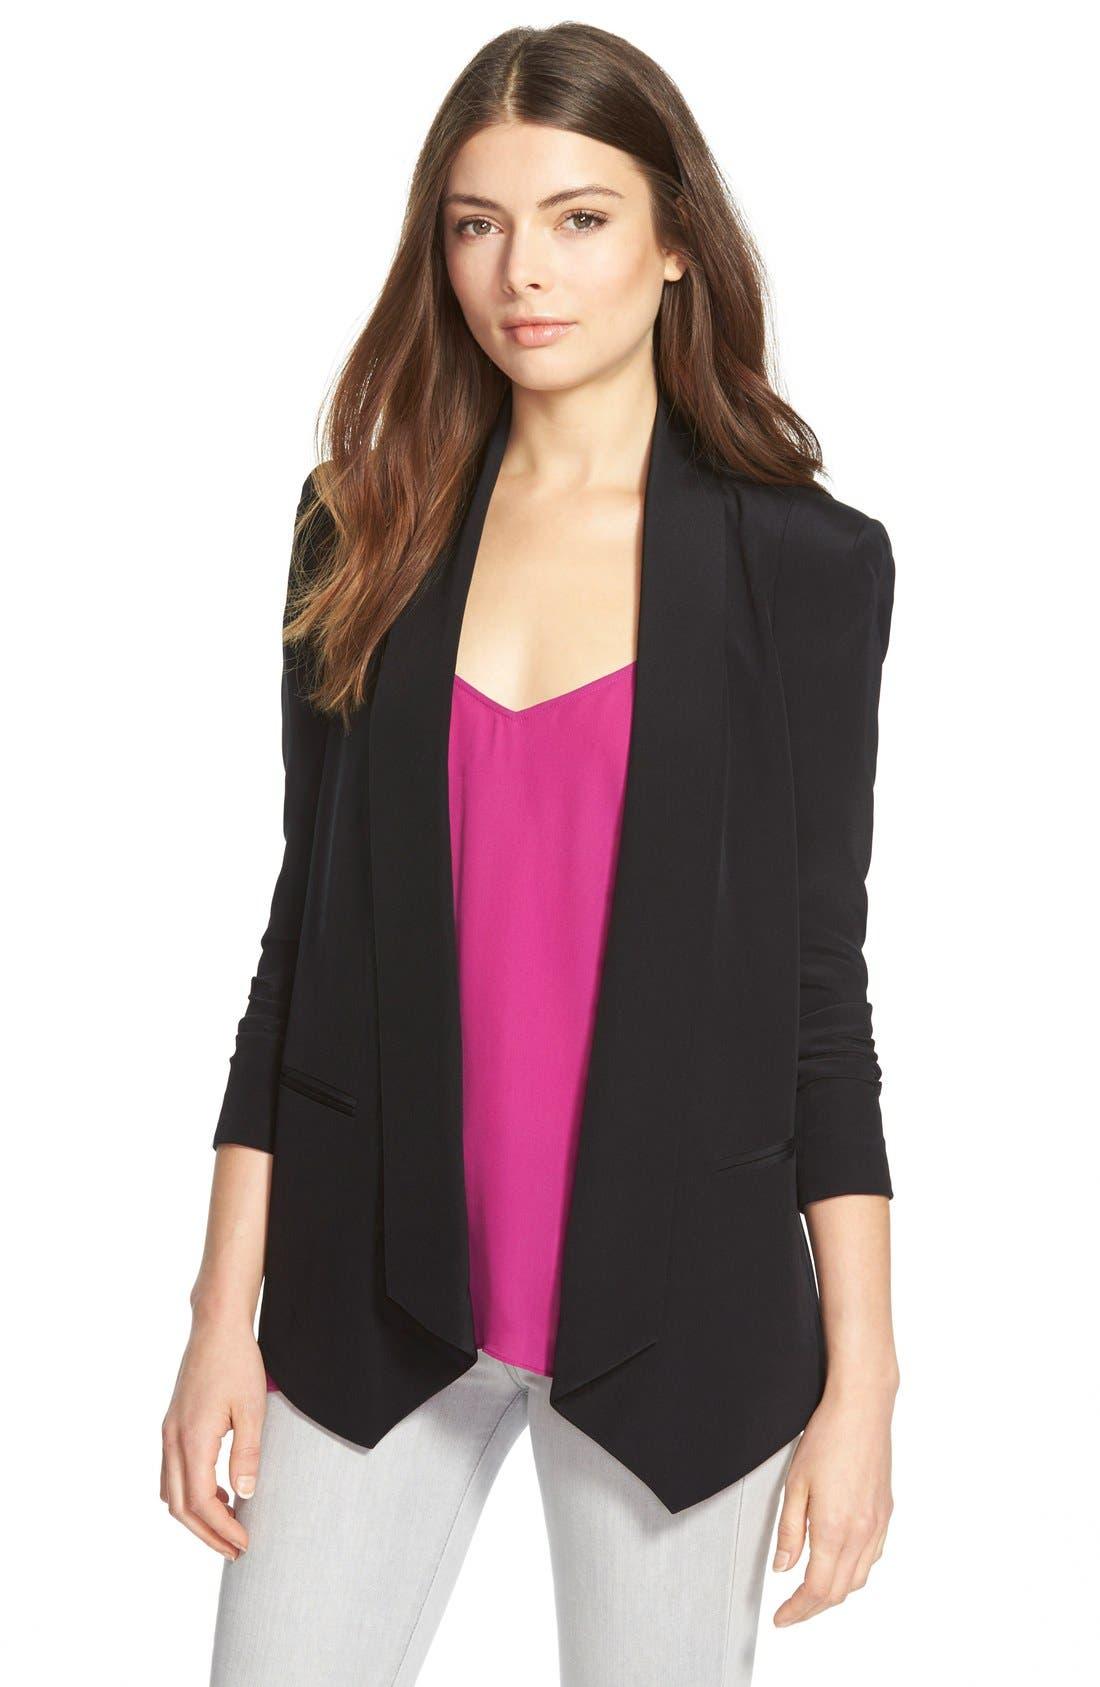 REBECCA MINKOFF, 'Becky' Long Tuxedo Blazer, Main thumbnail 1, color, 001